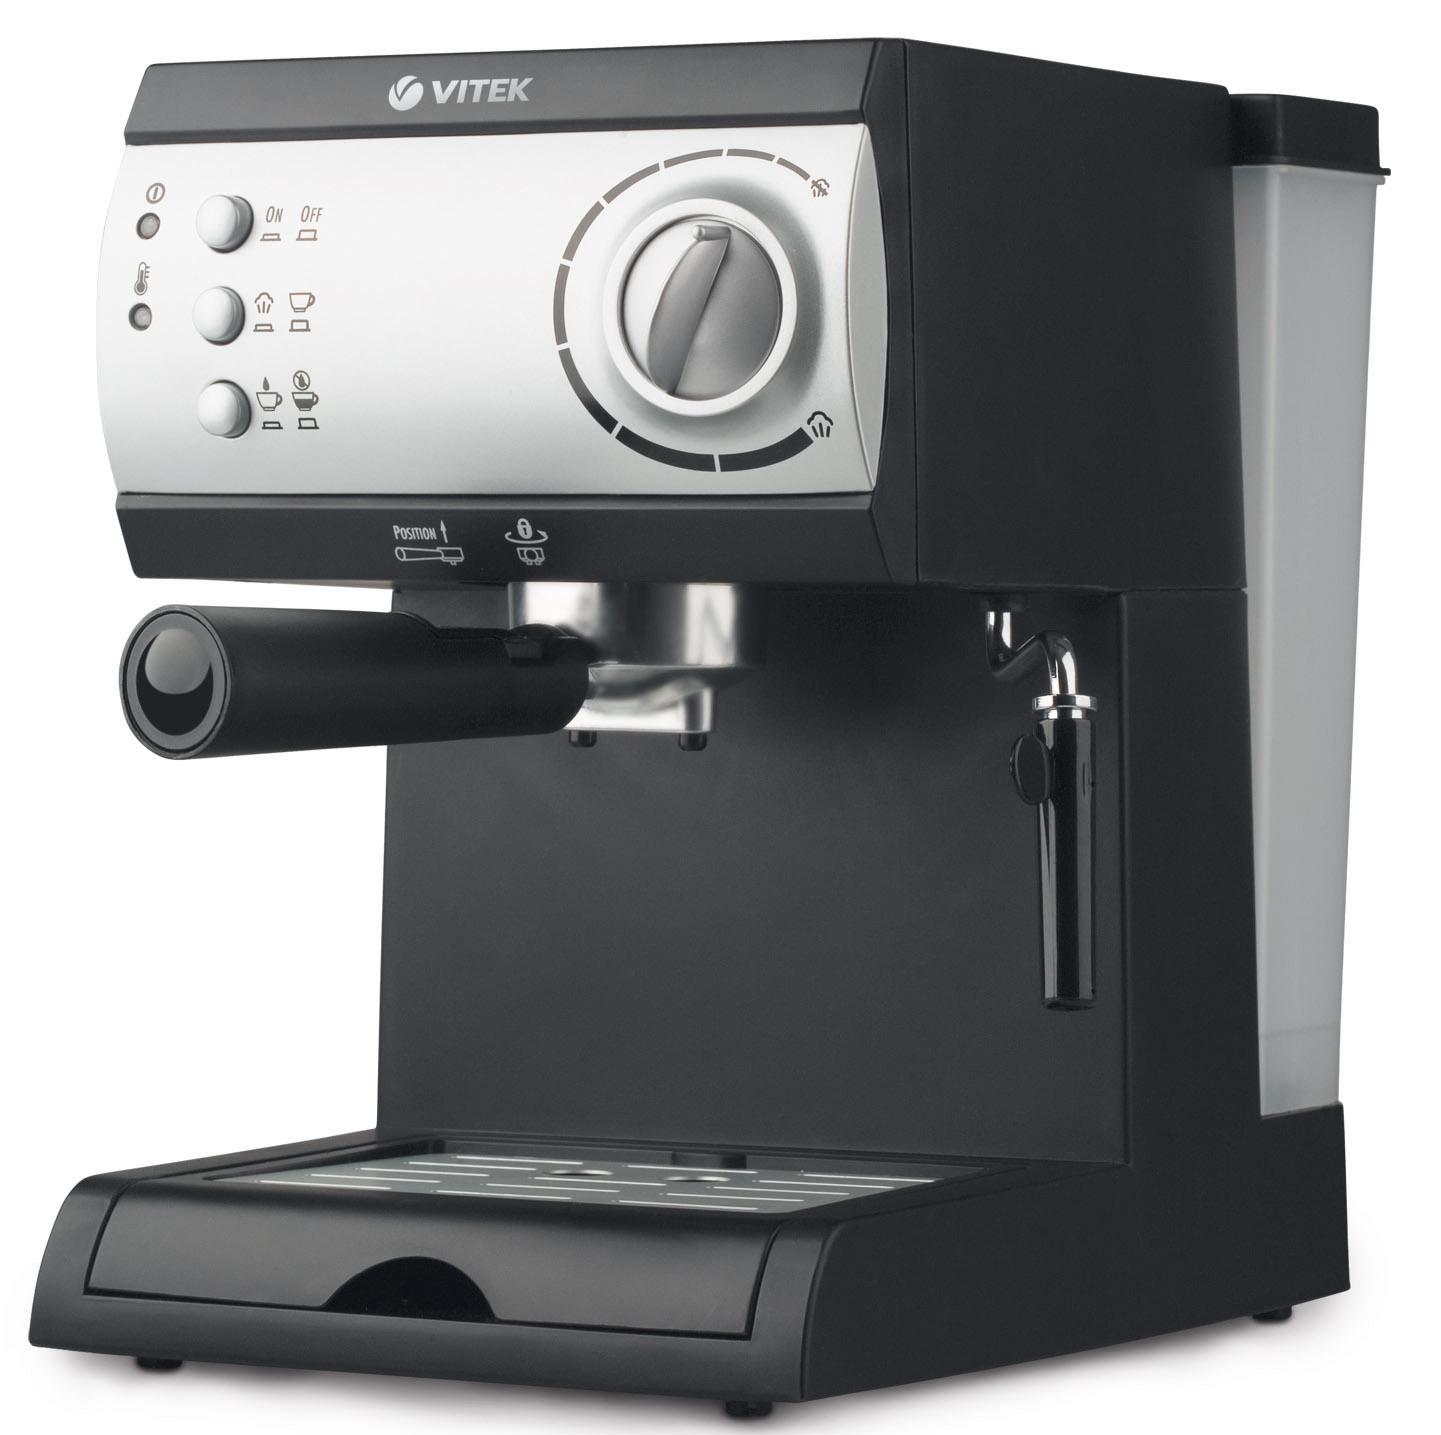 Кофеварка Vitek Vt-1511(bk) кофеварка эспрессо vitek vt 1511